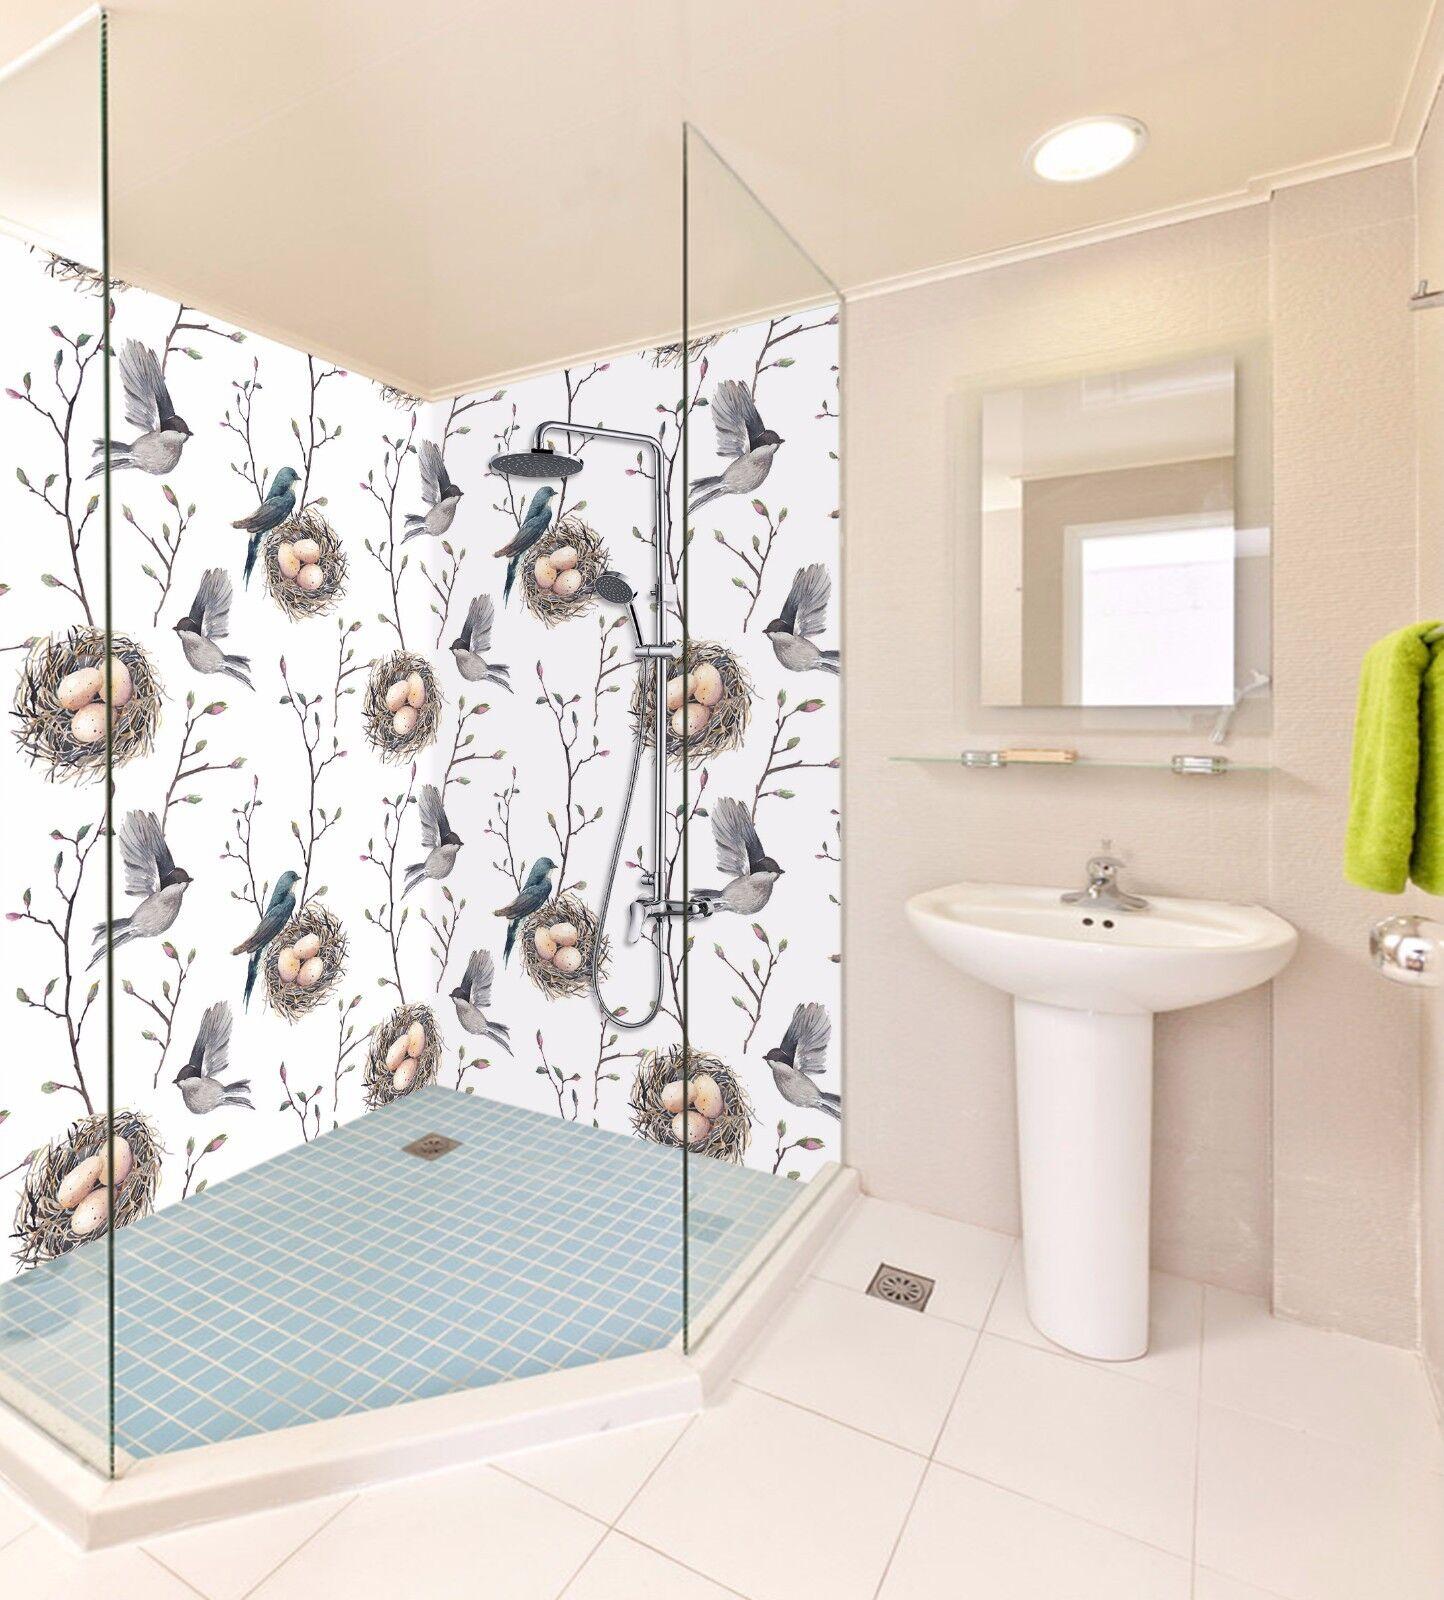 3D Tree Bird 693 WallPaper Bathroom Print Decal Wall Deco AJ WALLPAPER AU